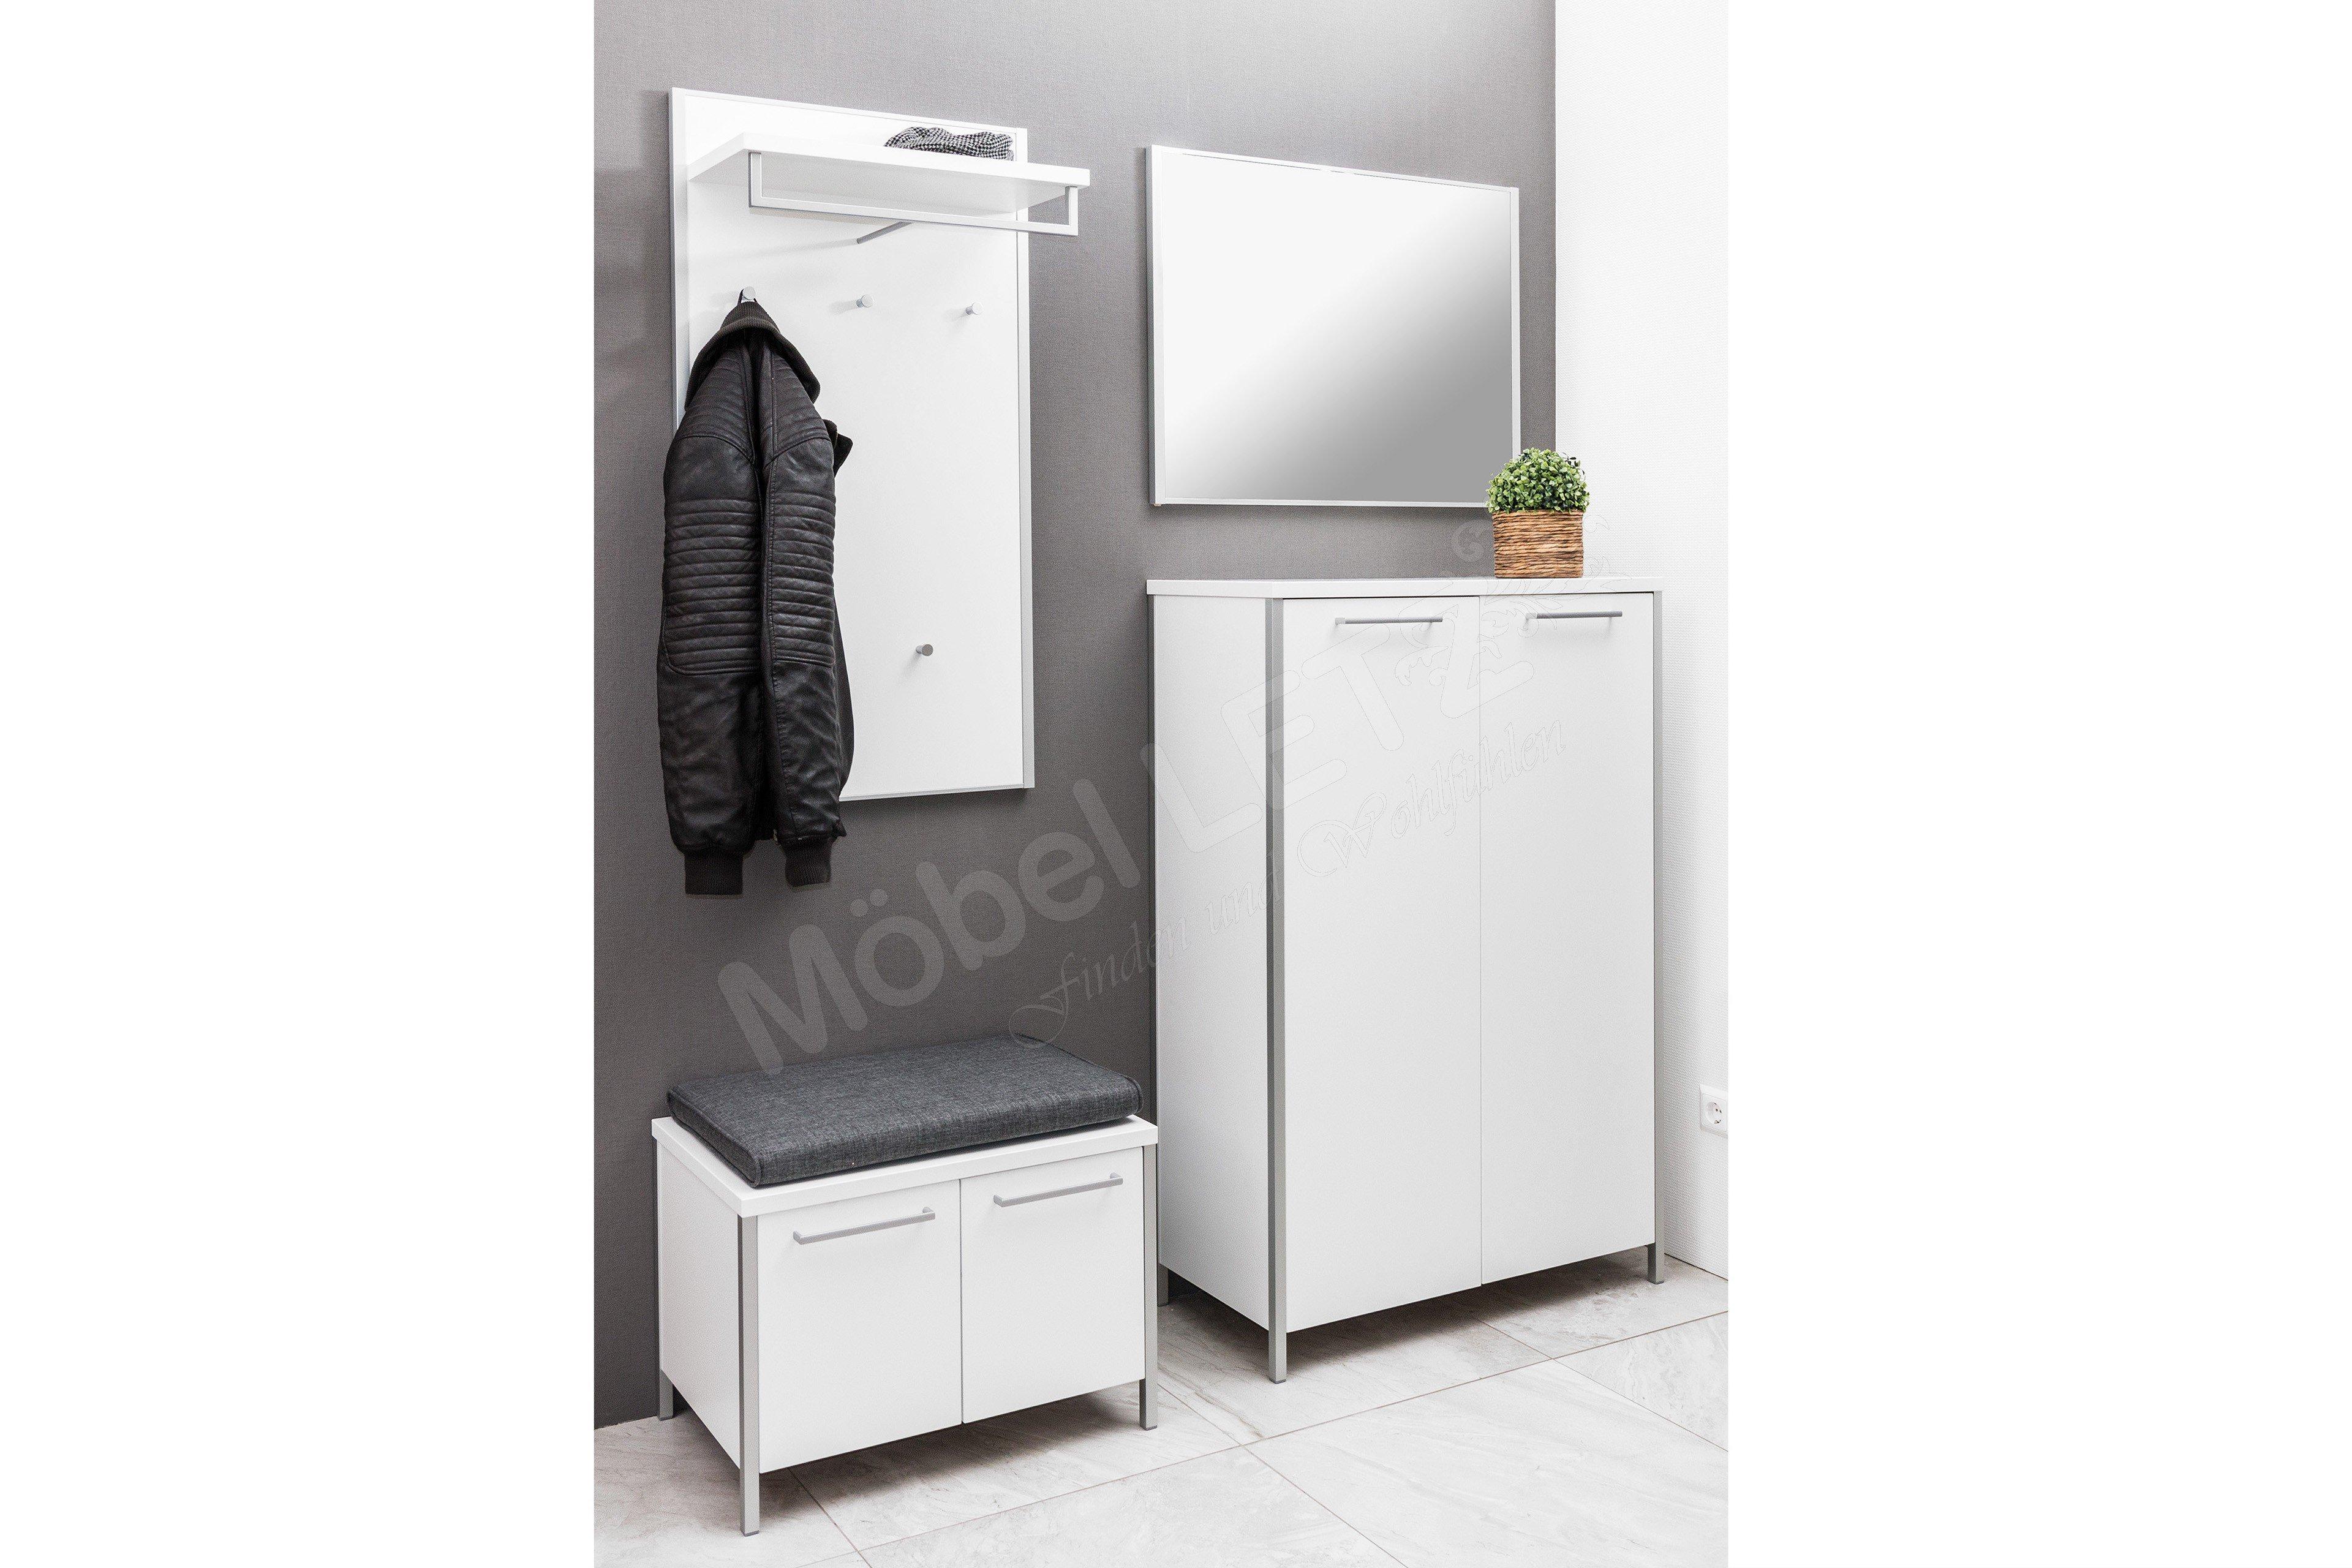 voss garderobe limana lack wei m bel letz ihr online shop. Black Bedroom Furniture Sets. Home Design Ideas